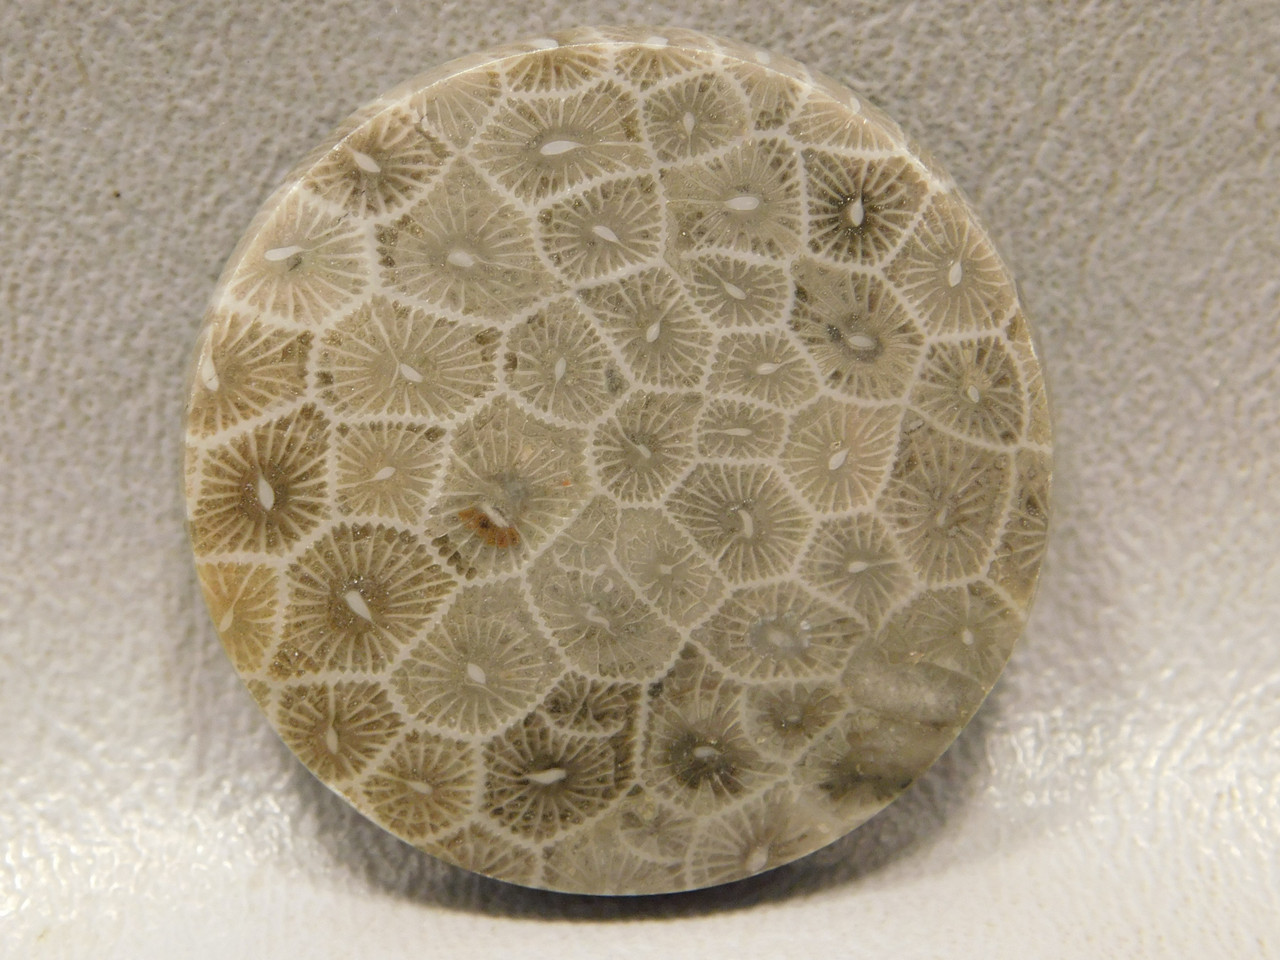 Flower Jasper Cabochon Loose Stones 33 mm Round Fossil #f8